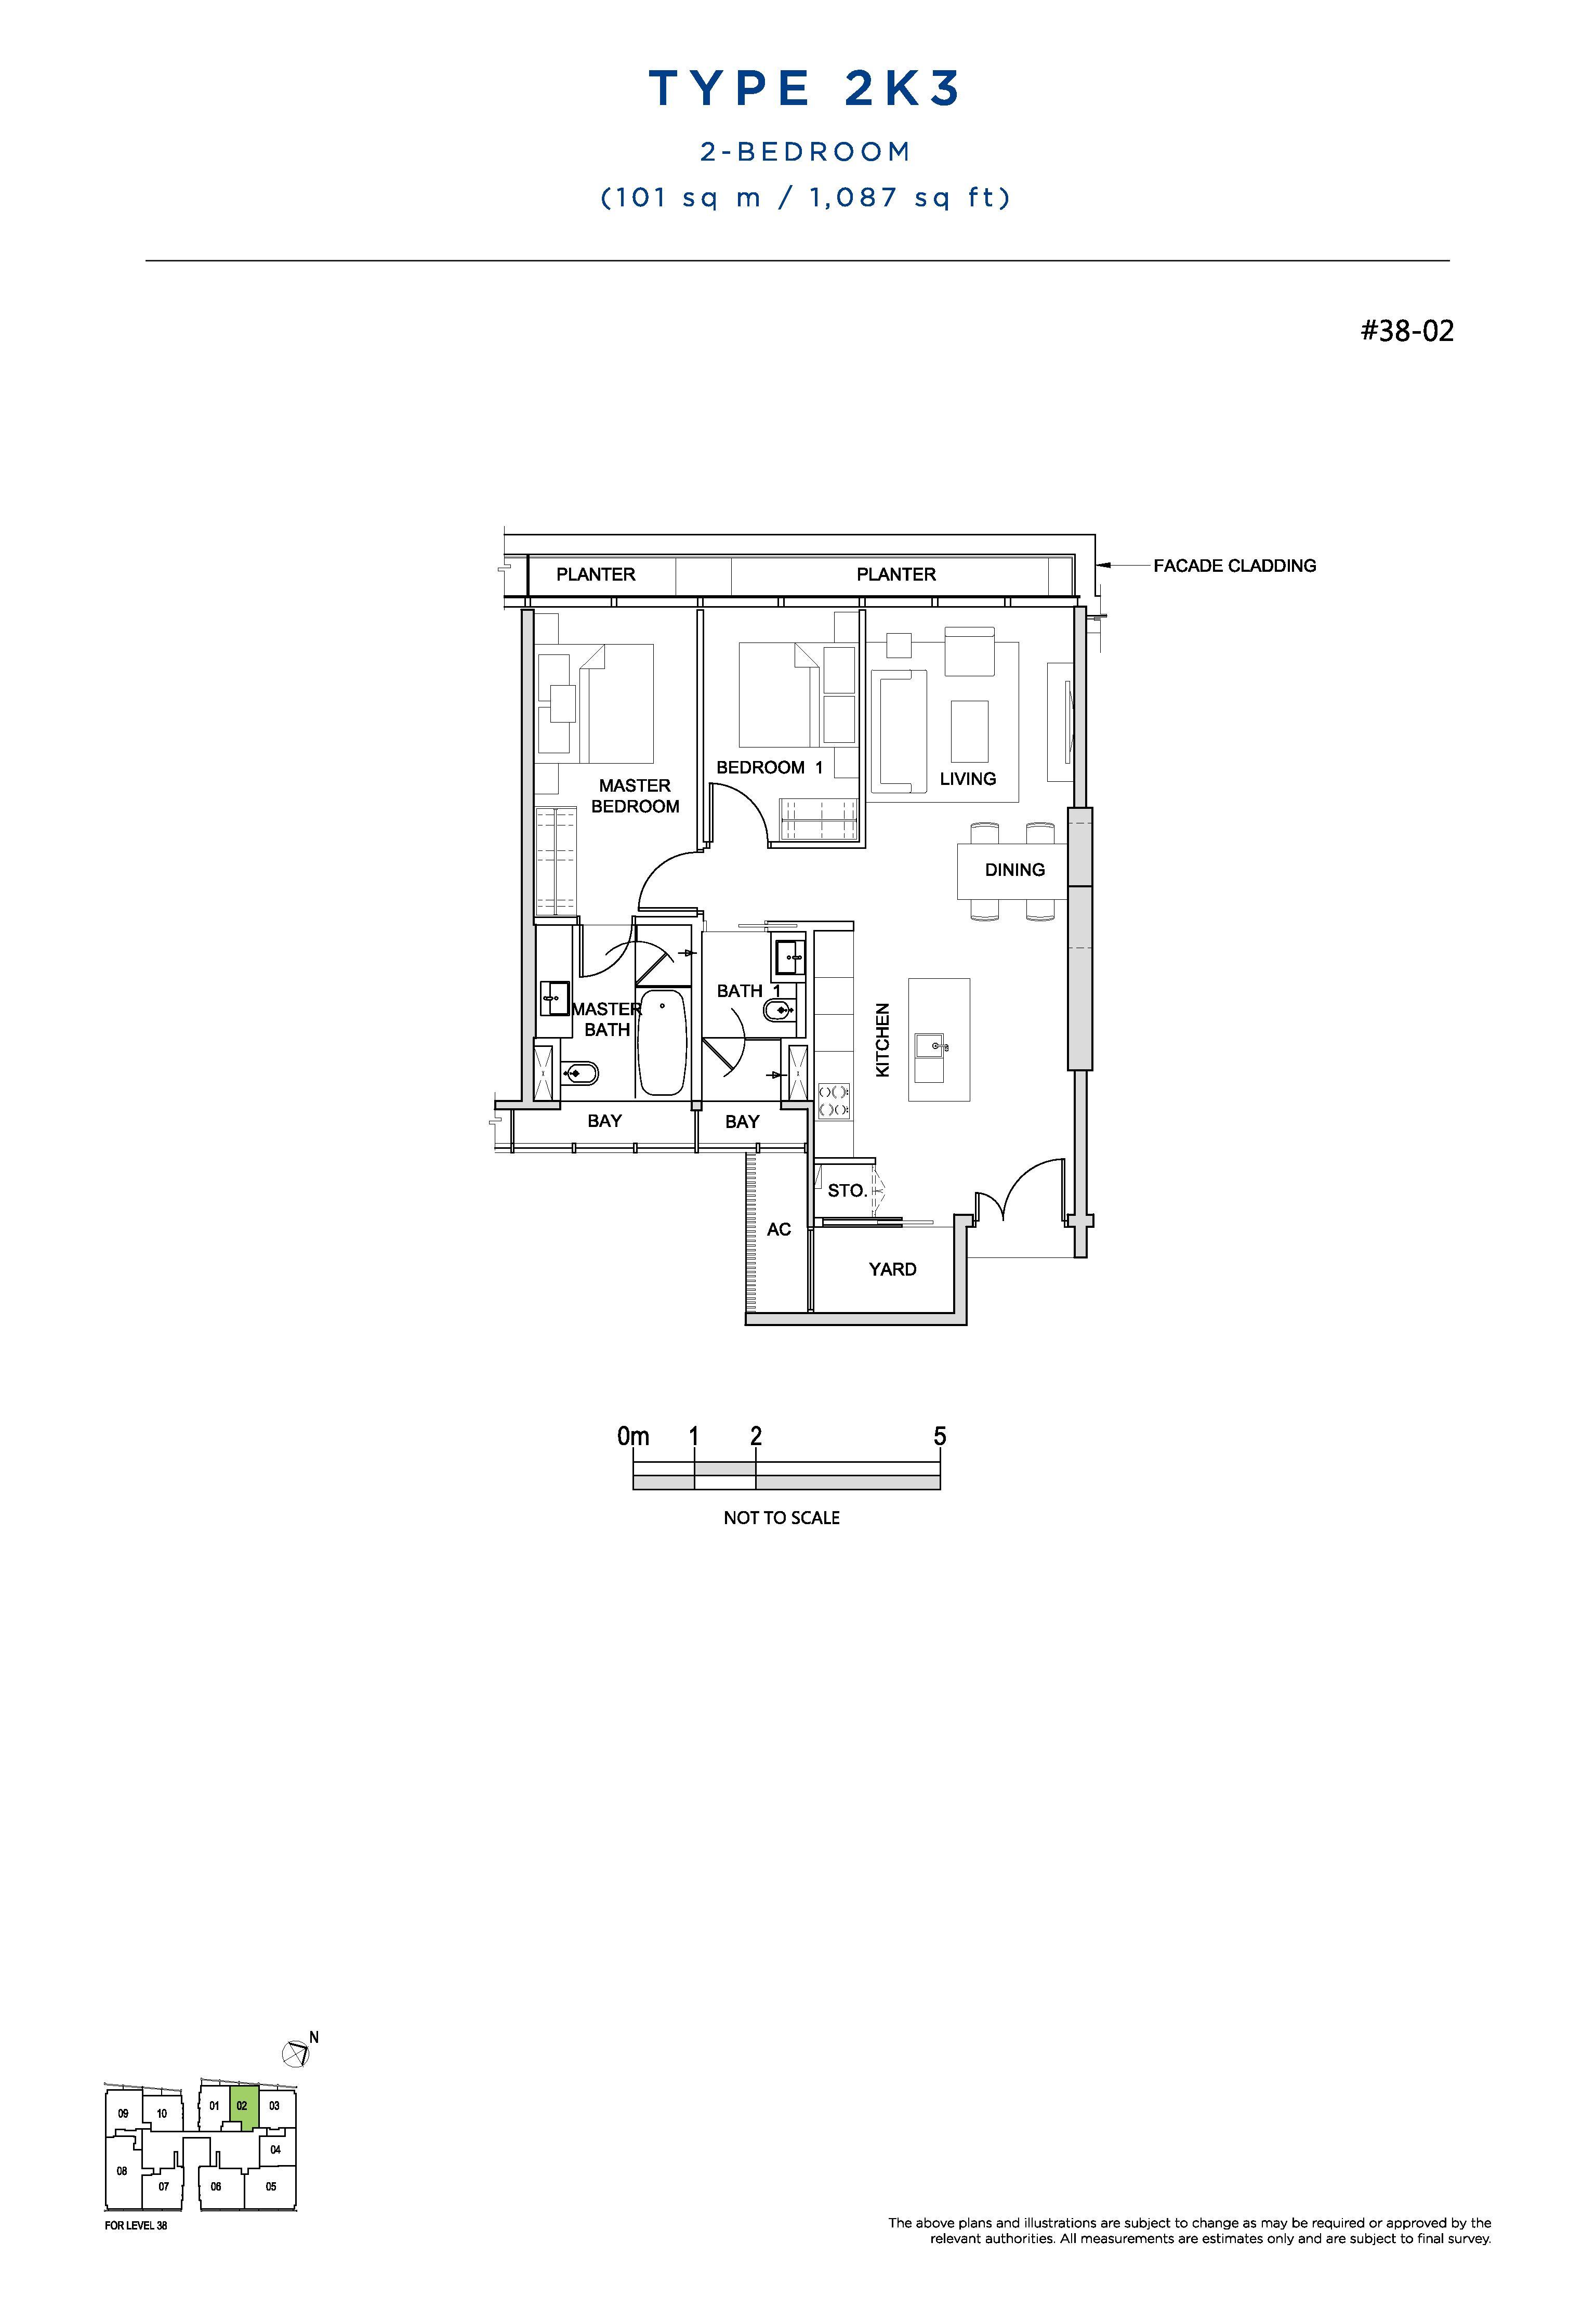 South Beach Residences 2 Bedroom Floor Plans Type 2K3